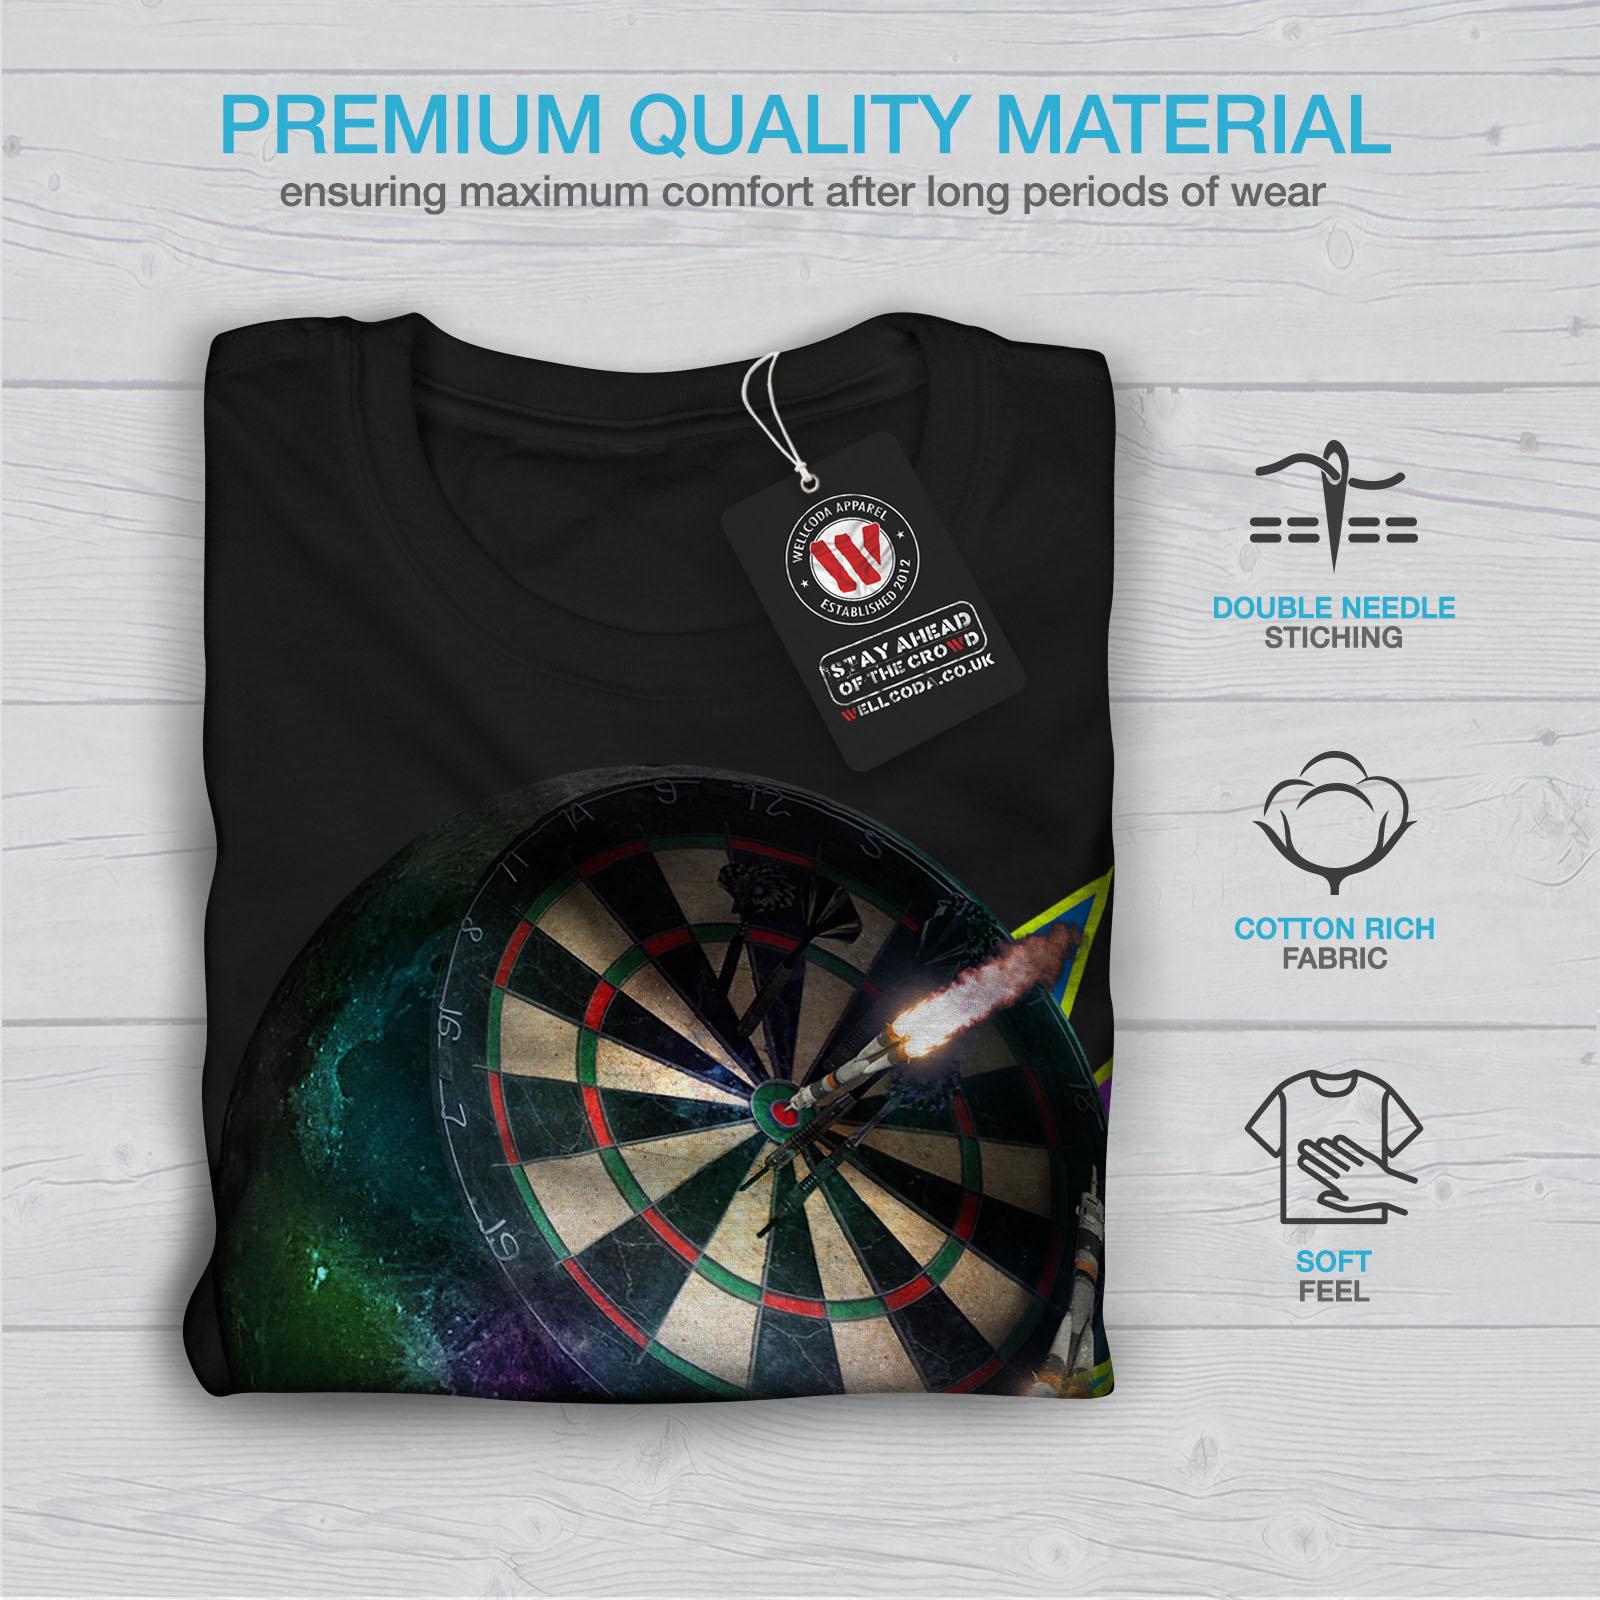 miniature 7 - Wellcoda Dart Board Gaming Womens T-shirt, Achieve Casual Design Printed Tee